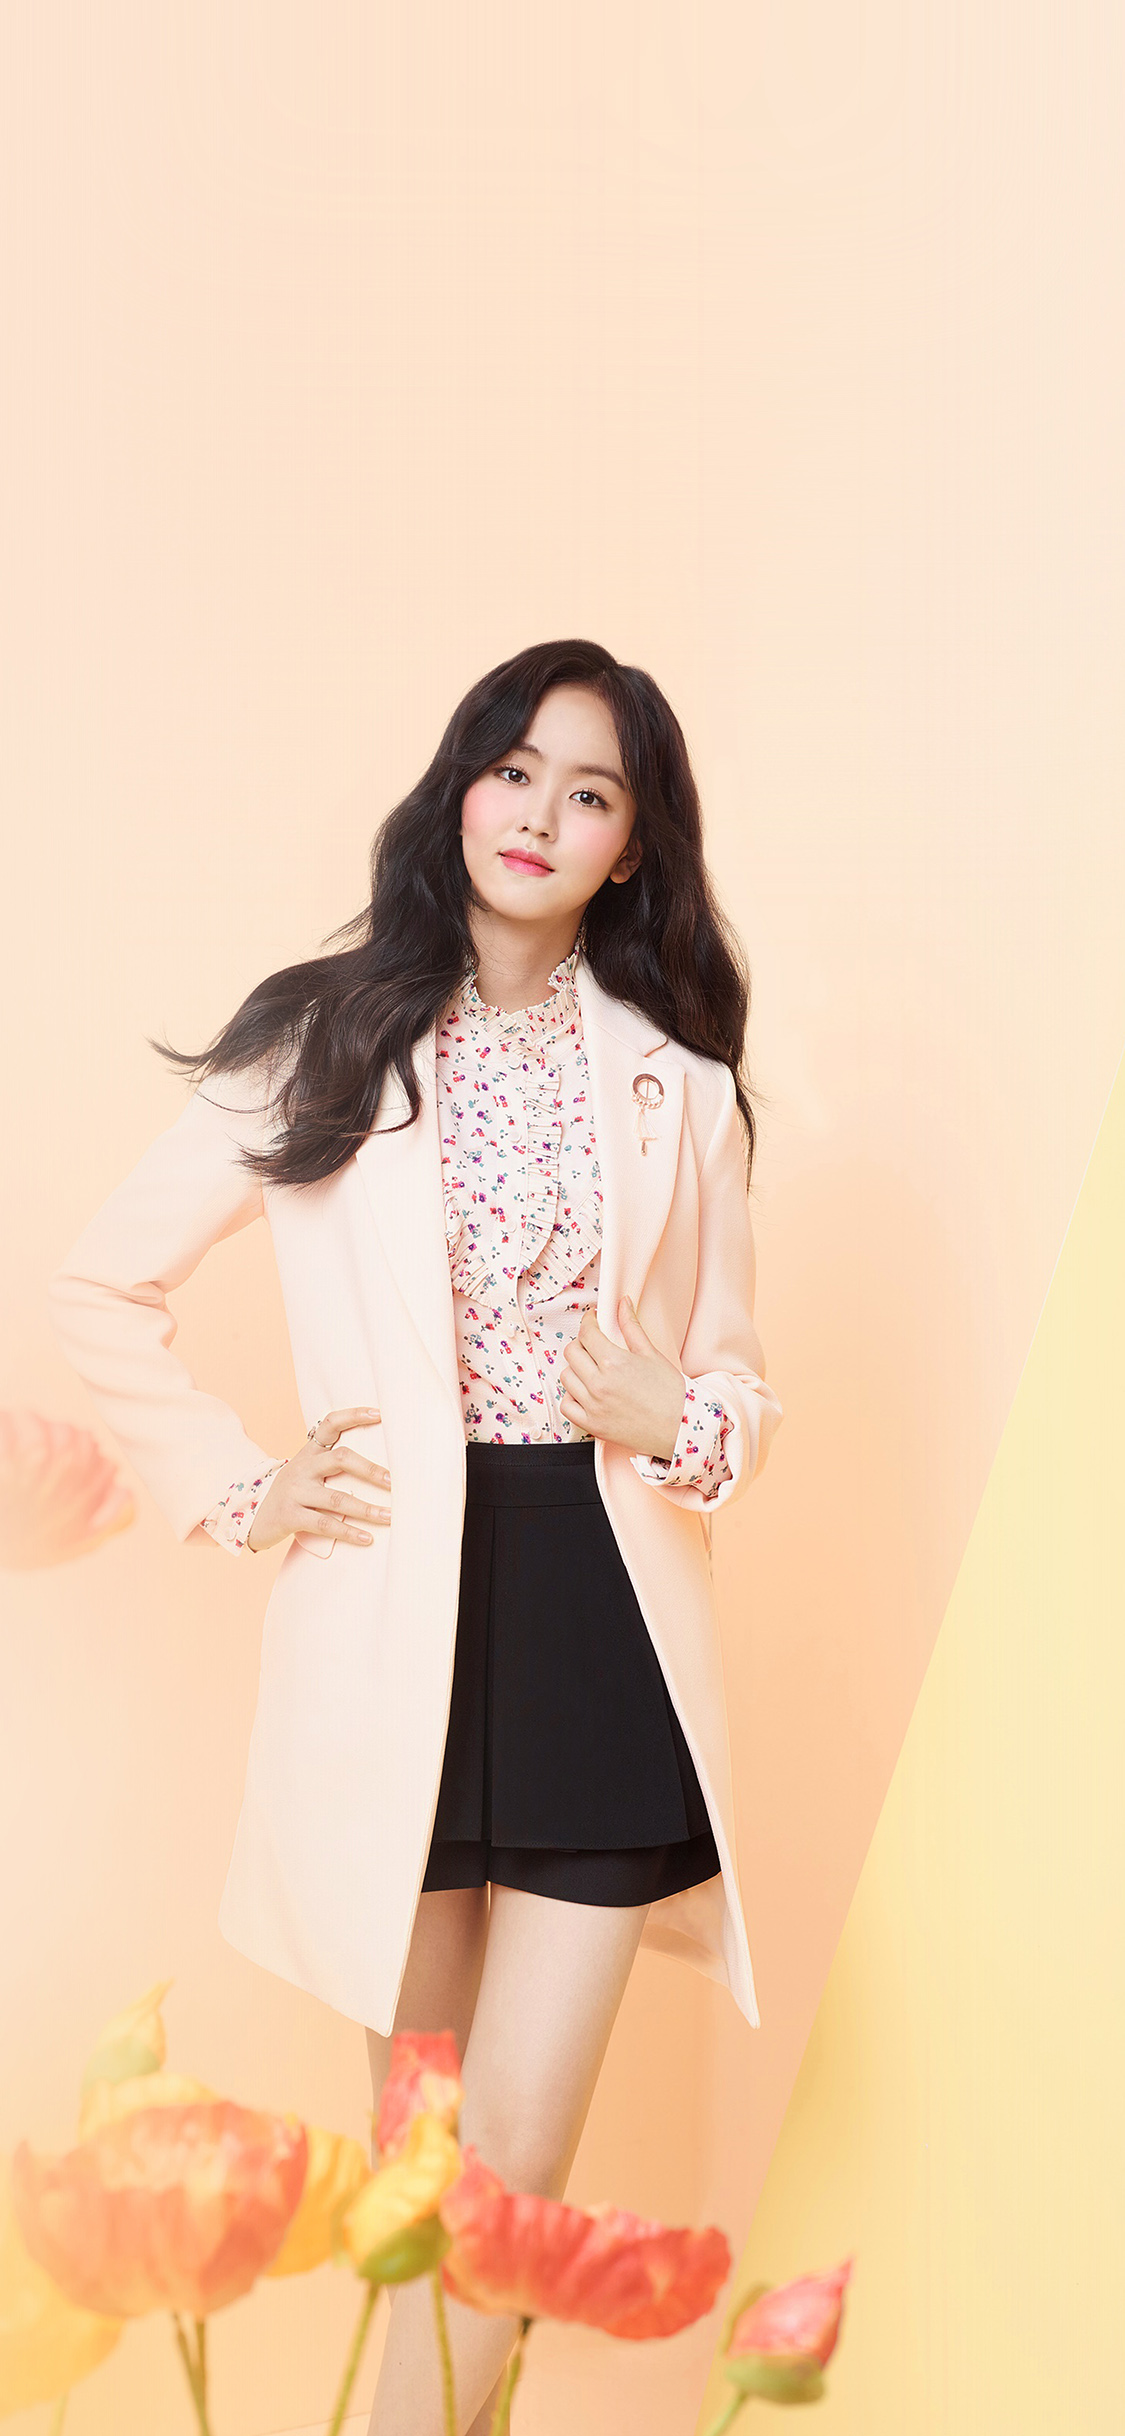 Anime Phone Wallpapers Girl Hm67 Kpop Girl Pink Pastel Color Wallpaper